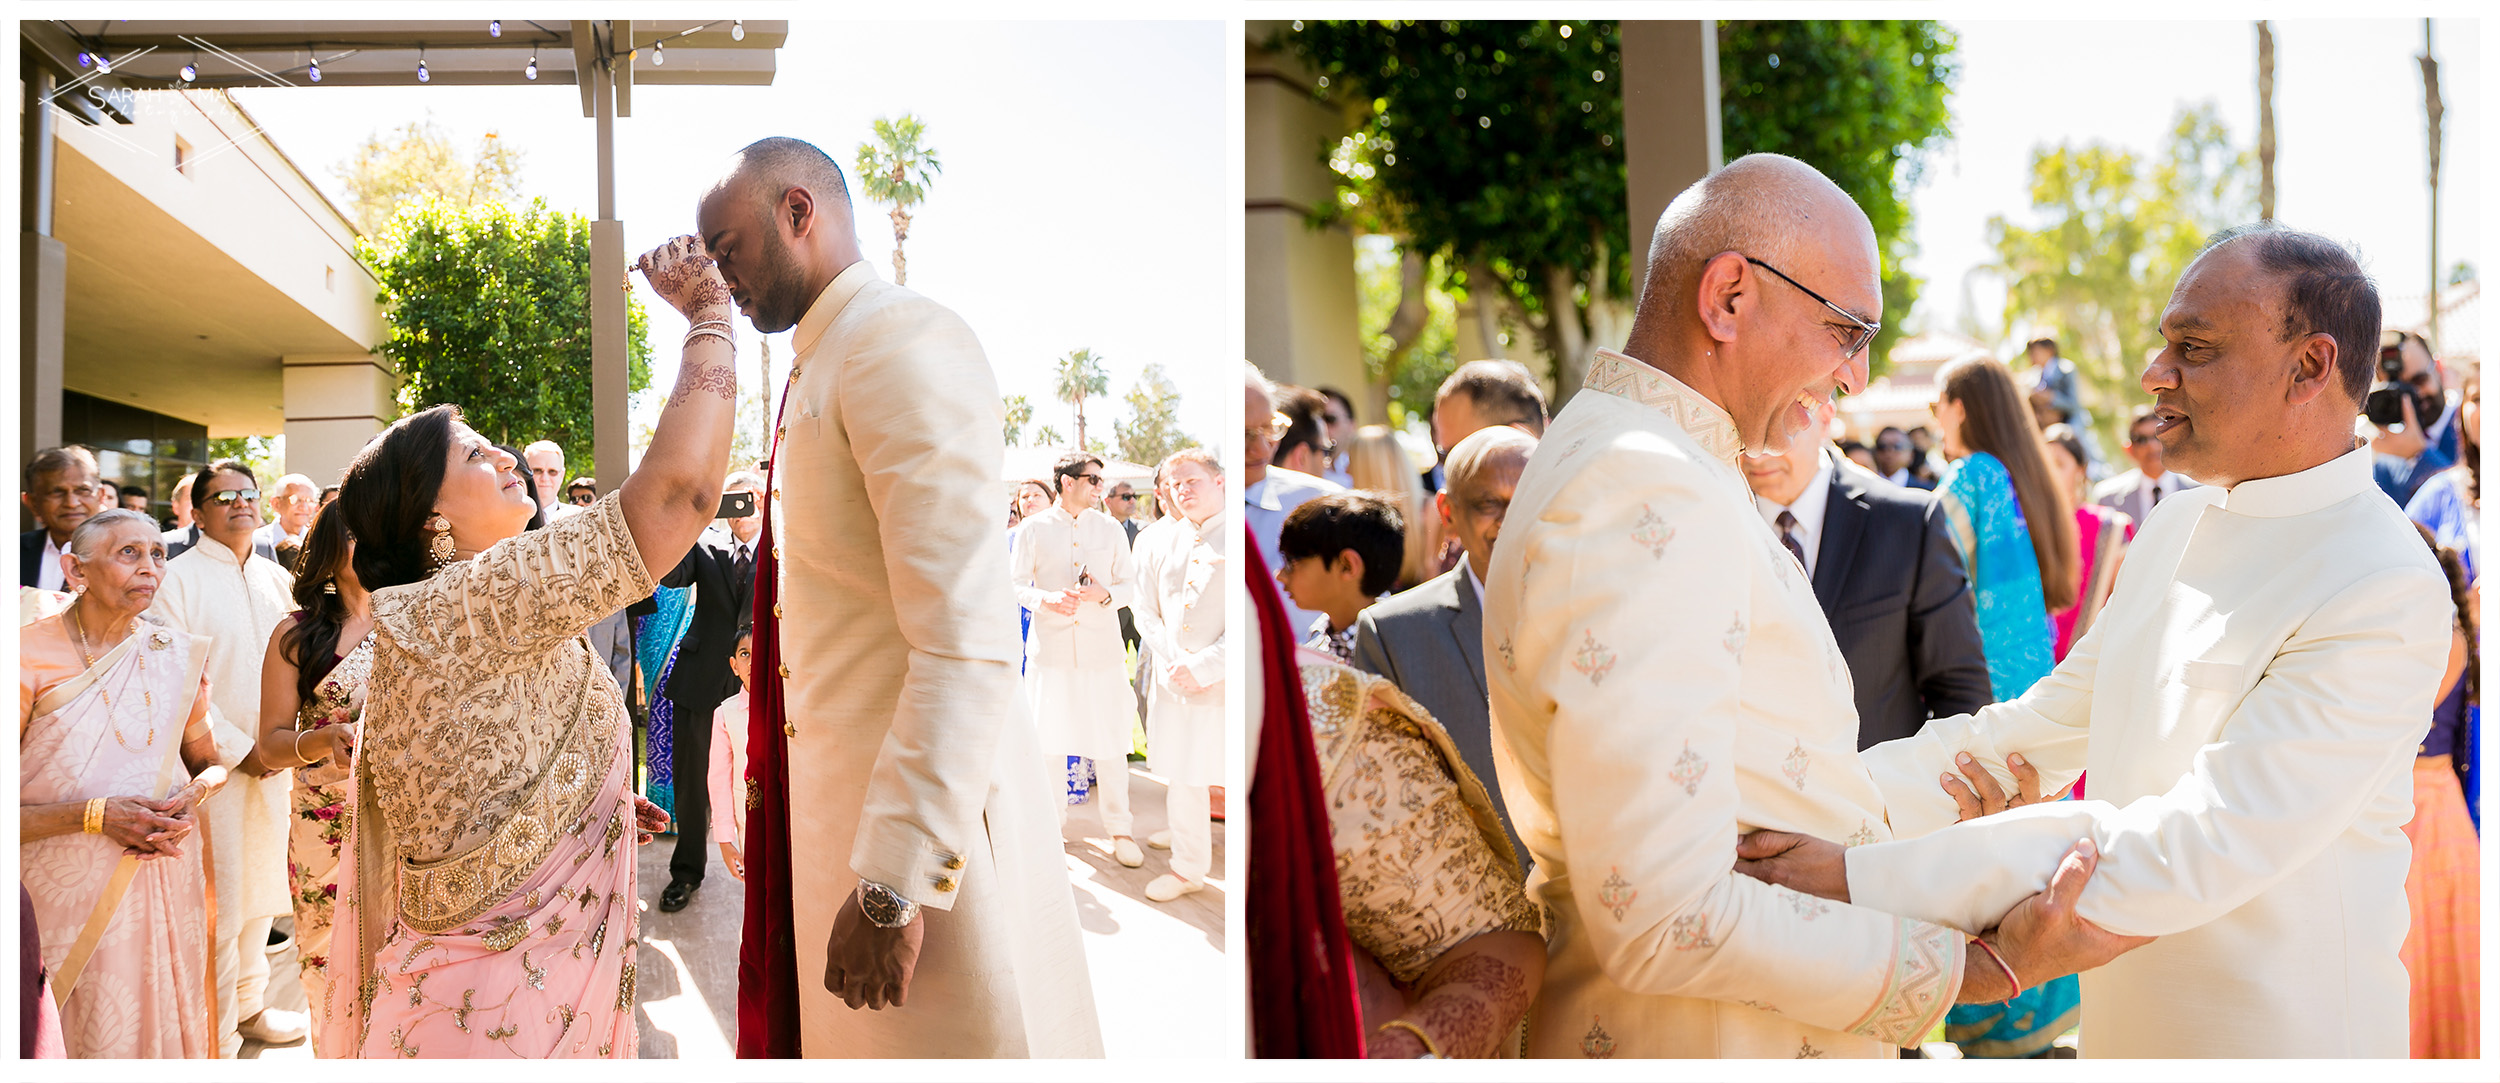 PR-Double-Tree-Hilton-Palm-Springs-Indian-Wedding-56.jpg